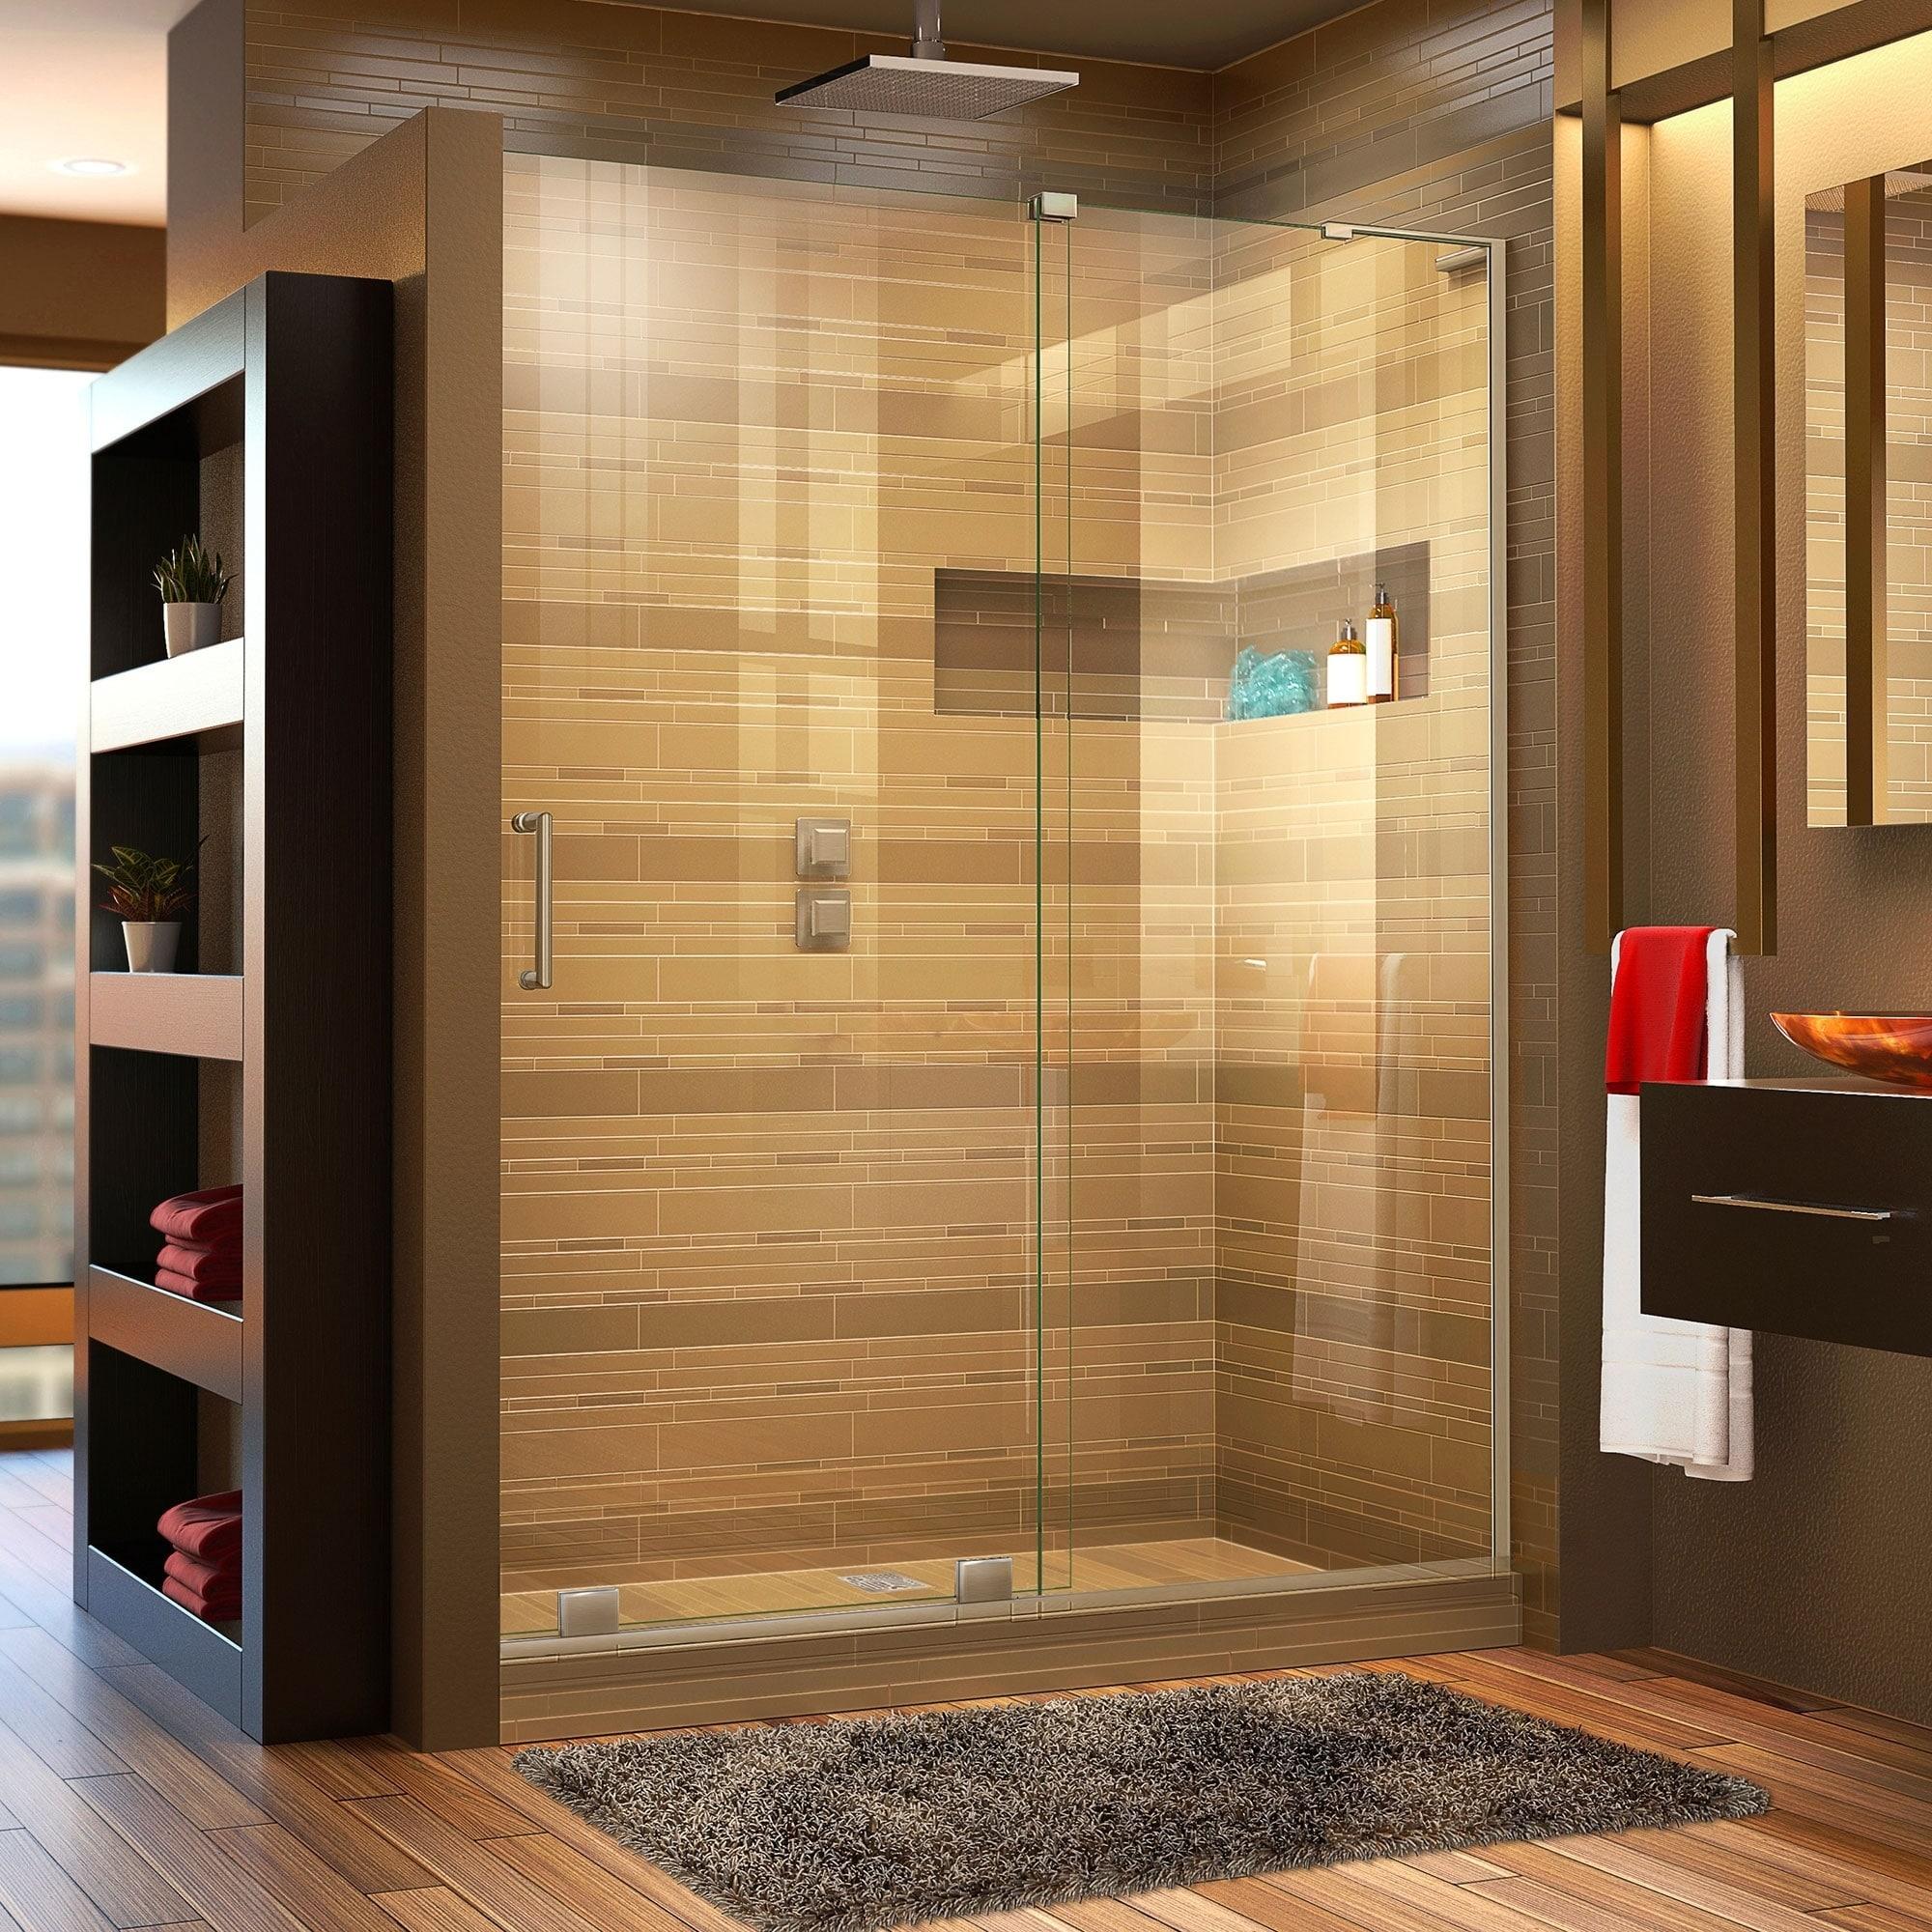 Dreamline Mirage X 56 60 In W X 72 In H Frameless Sliding Shower Door